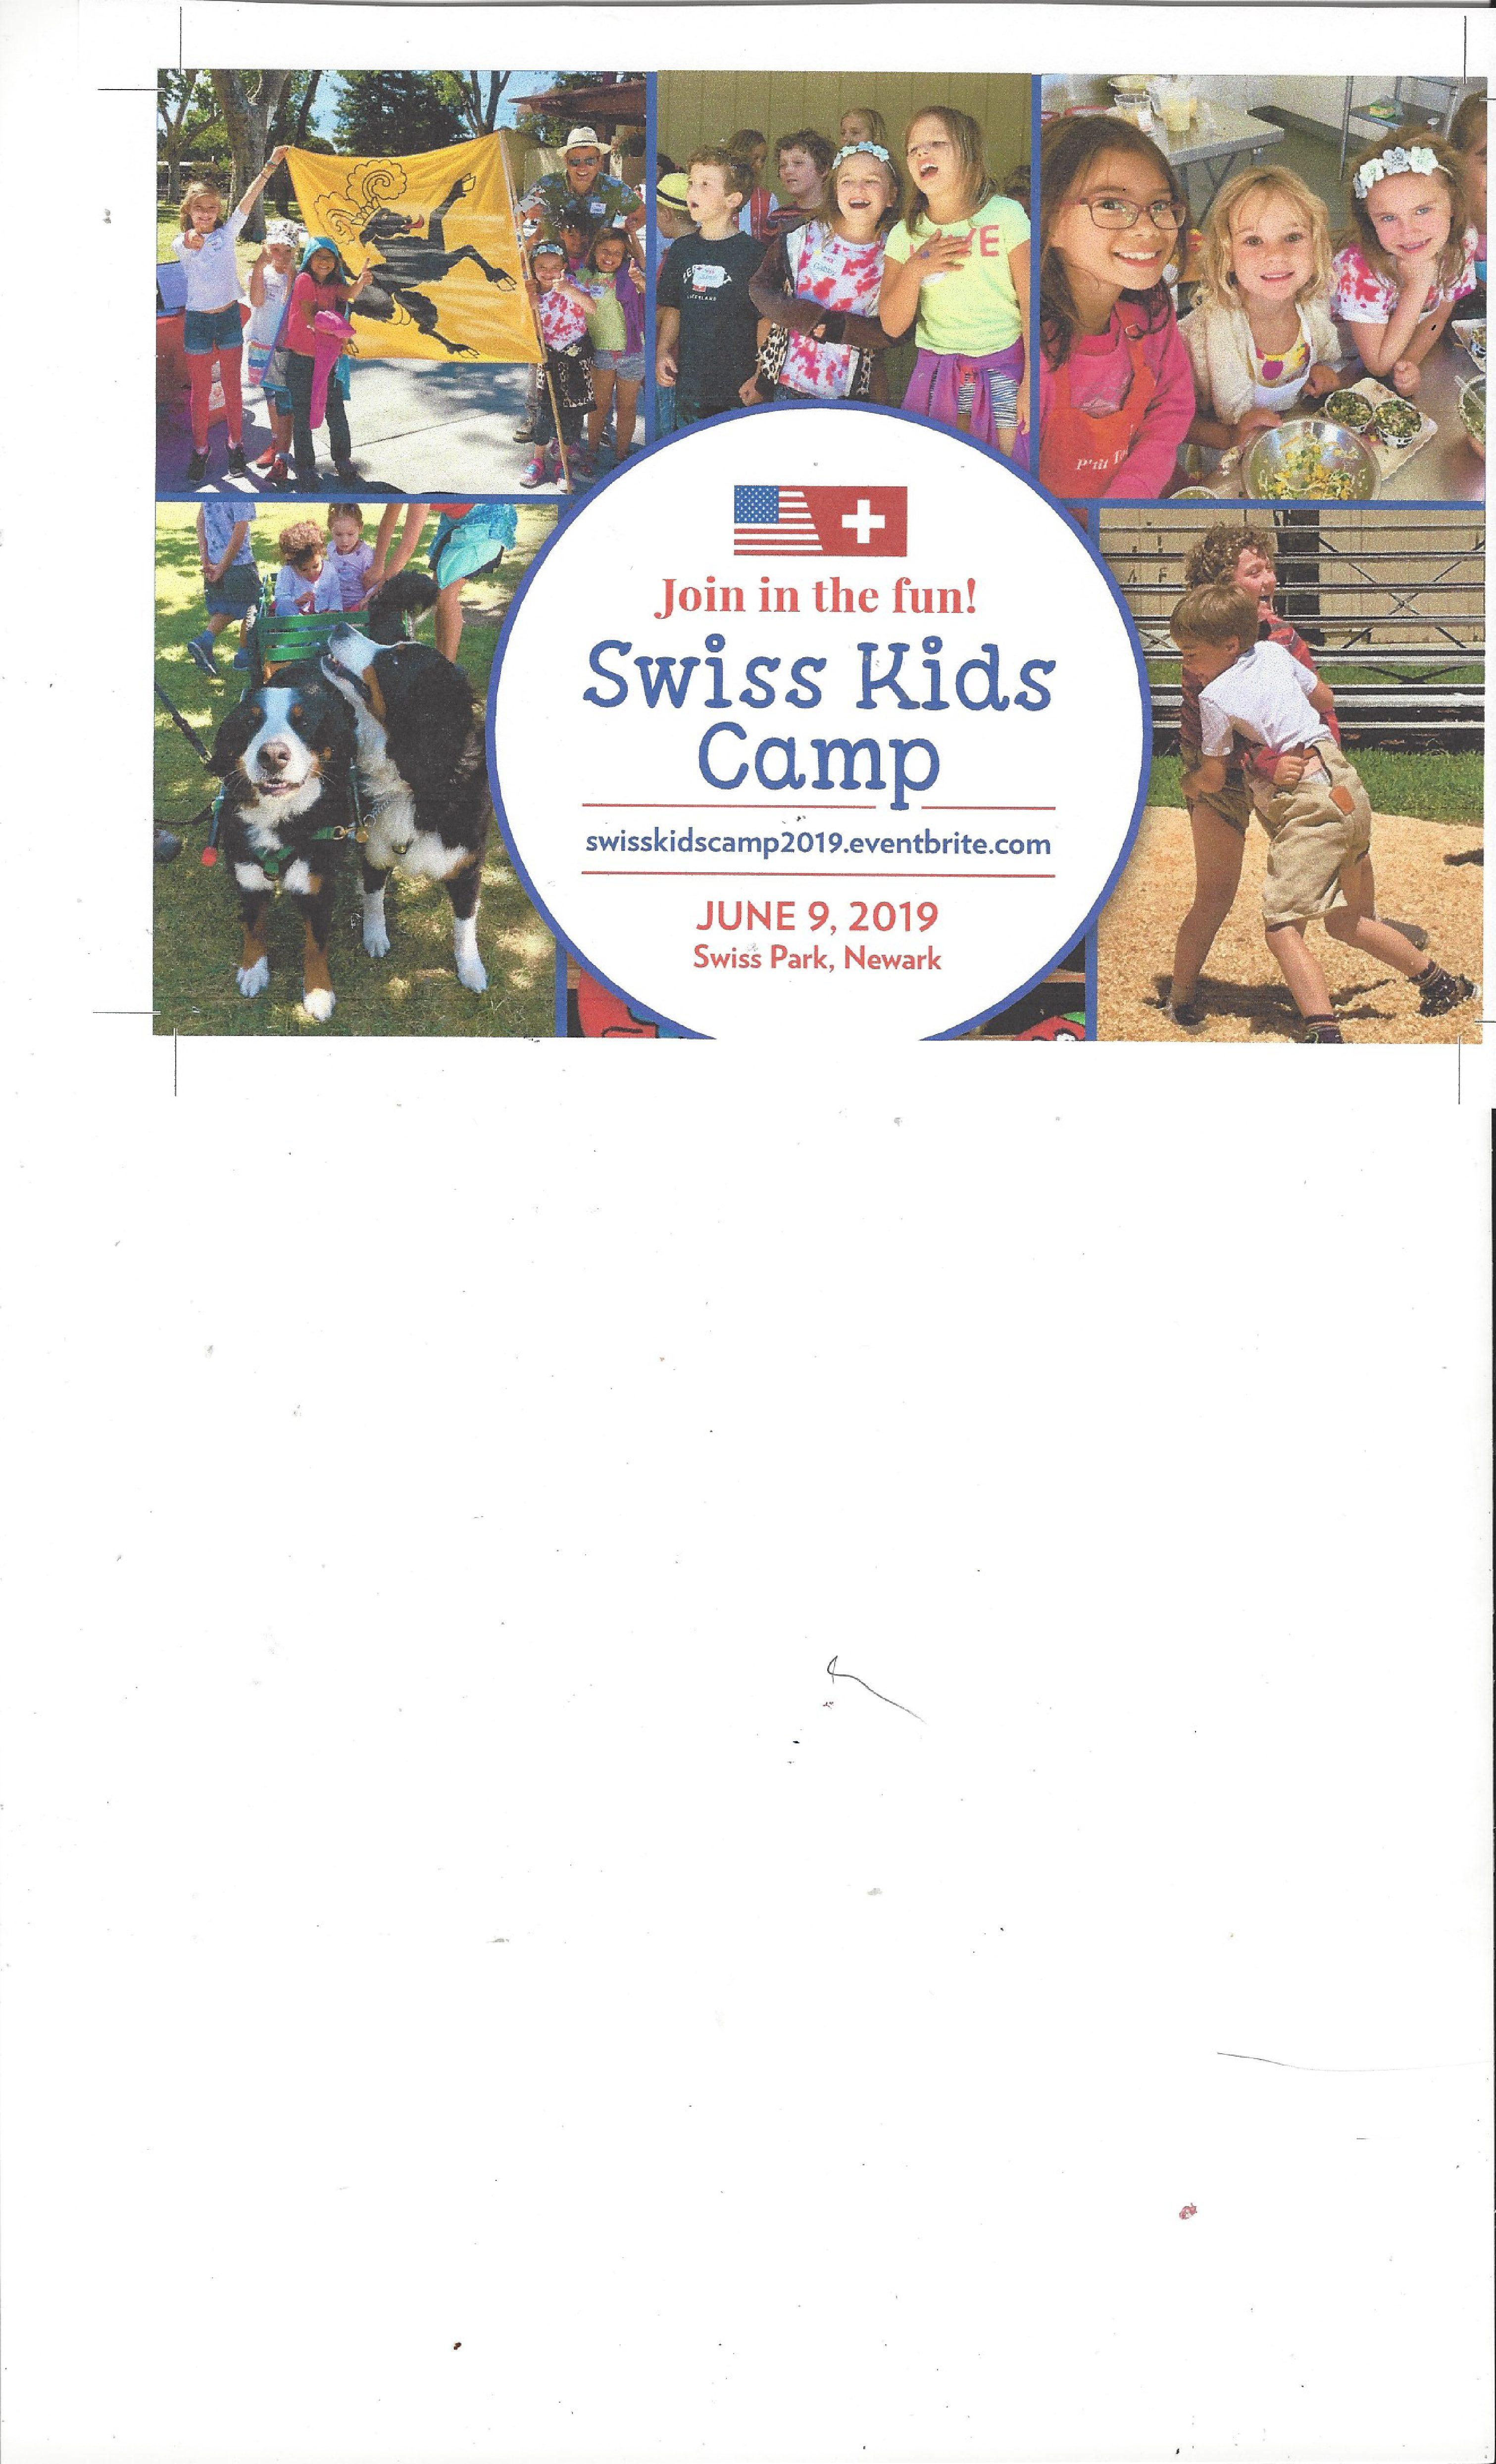 SWISS KIDS CAMP